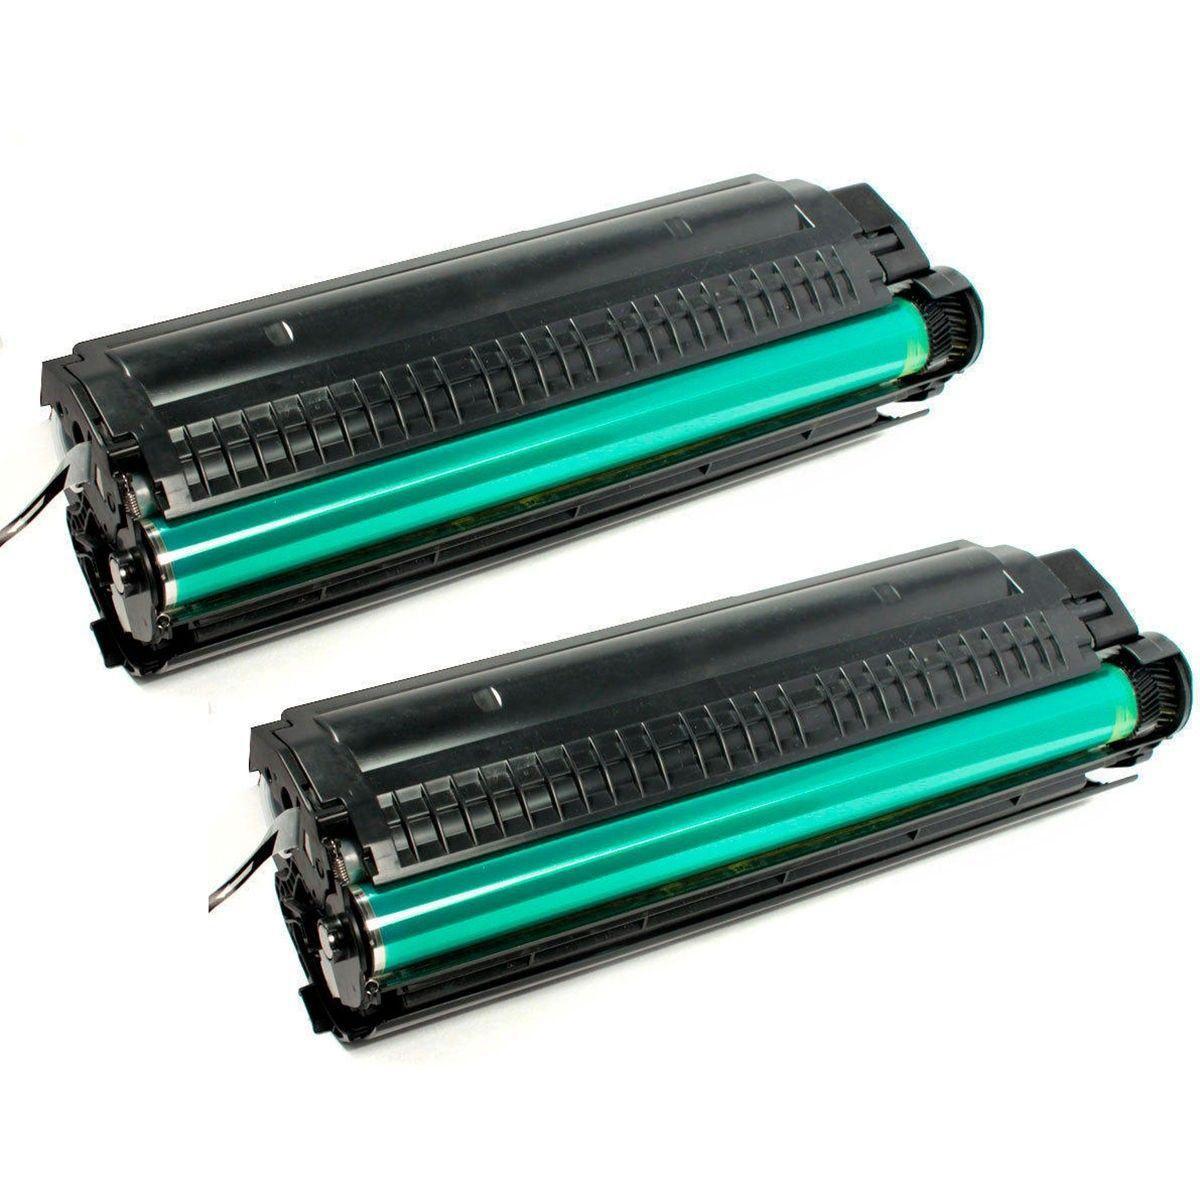 Compatível: Kit 2x Toner Q2612A para HP 1010 1012 1015 1018 1020 1022 1022n 1022nw 3020 3055nf M1005 / Preto / 2.000